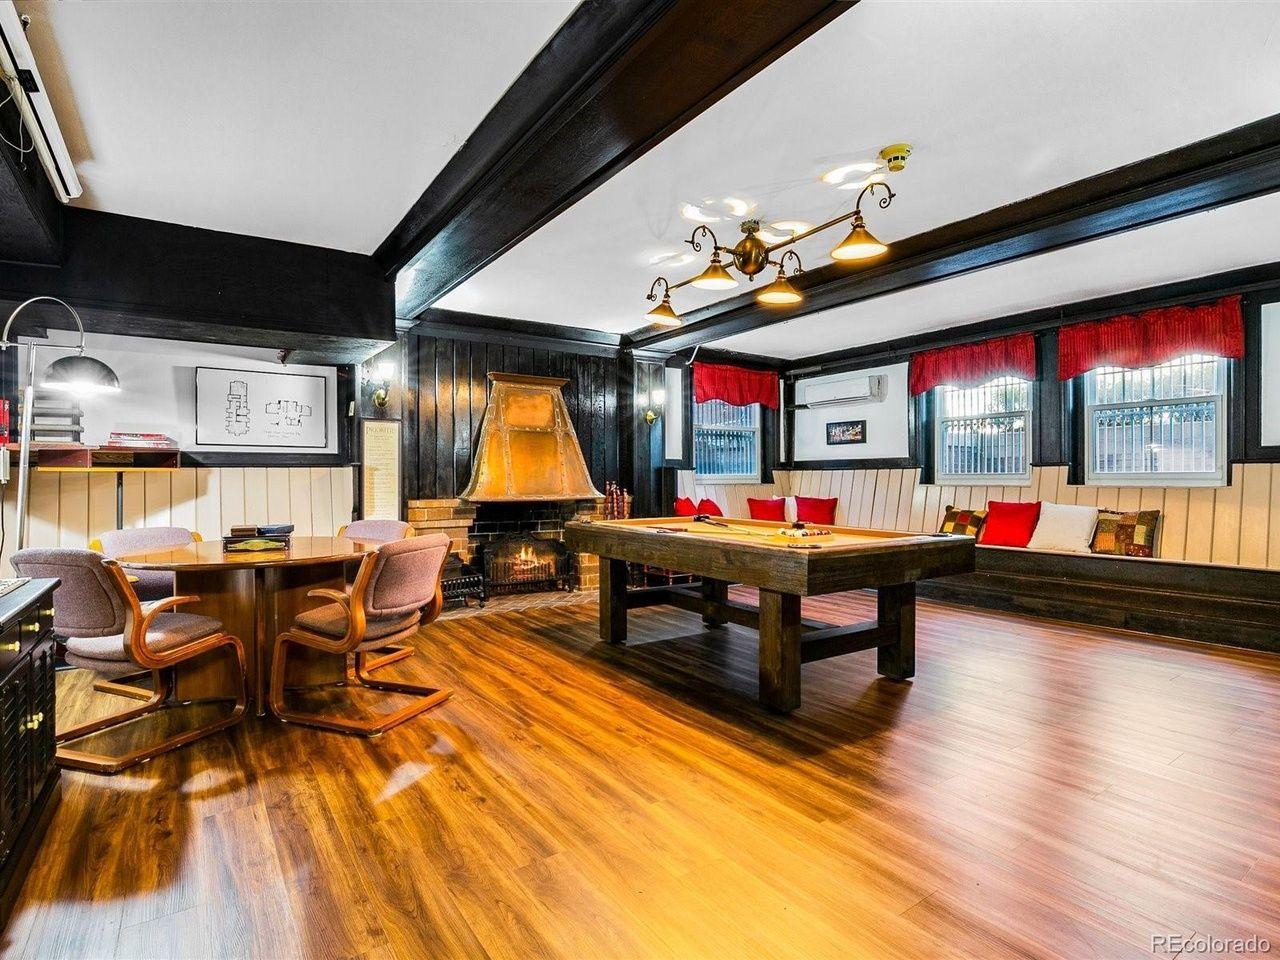 1350 N. Logan St game room